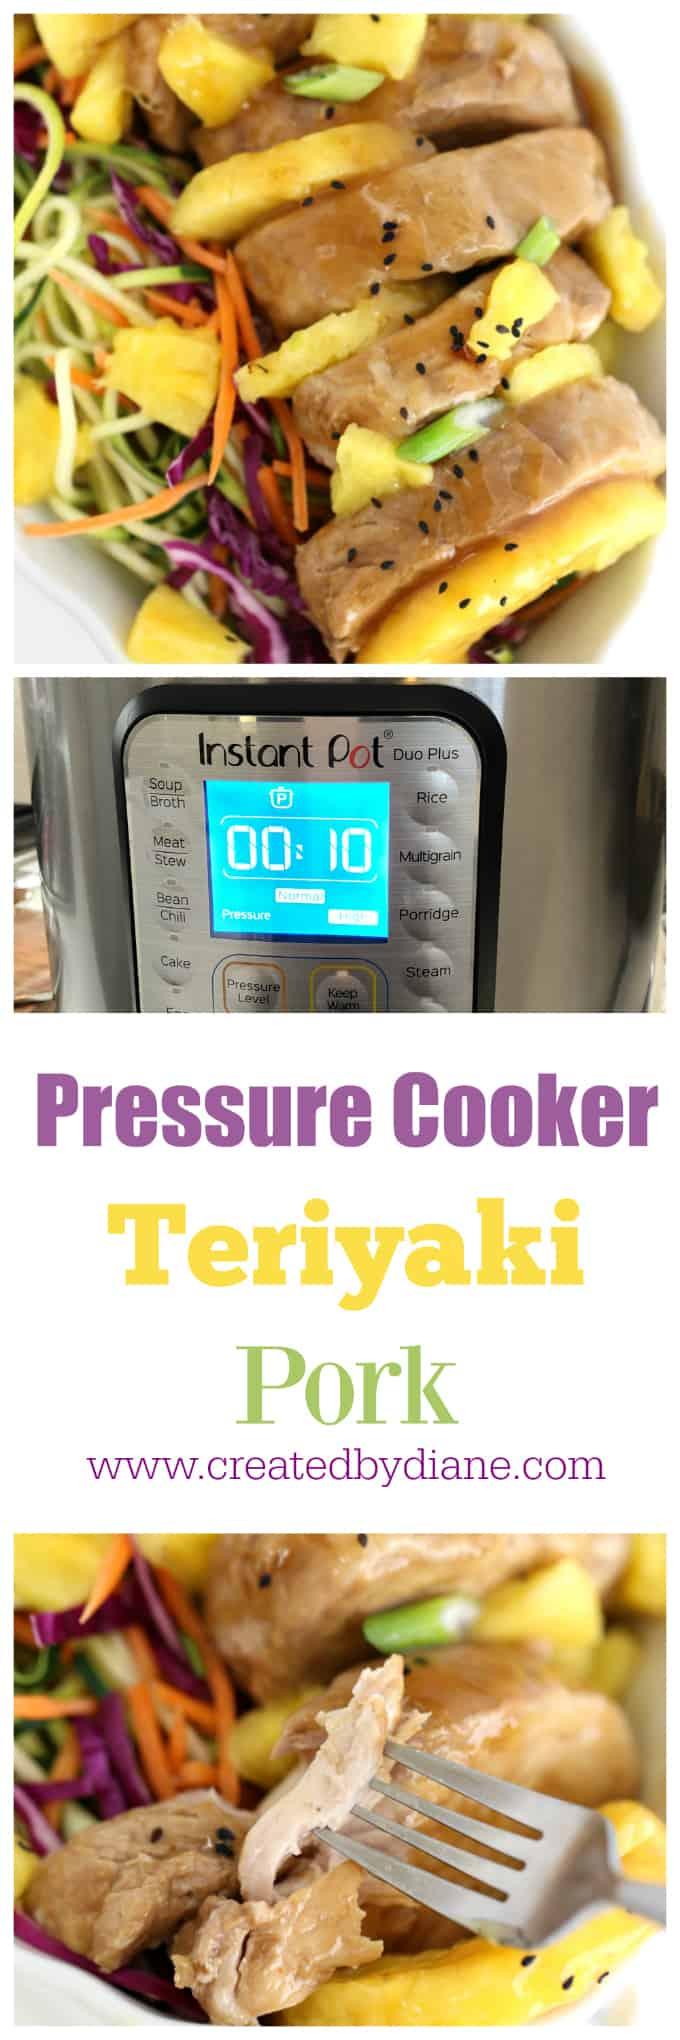 tender pressure cooker pork teriyaki www.createdbydiane.com